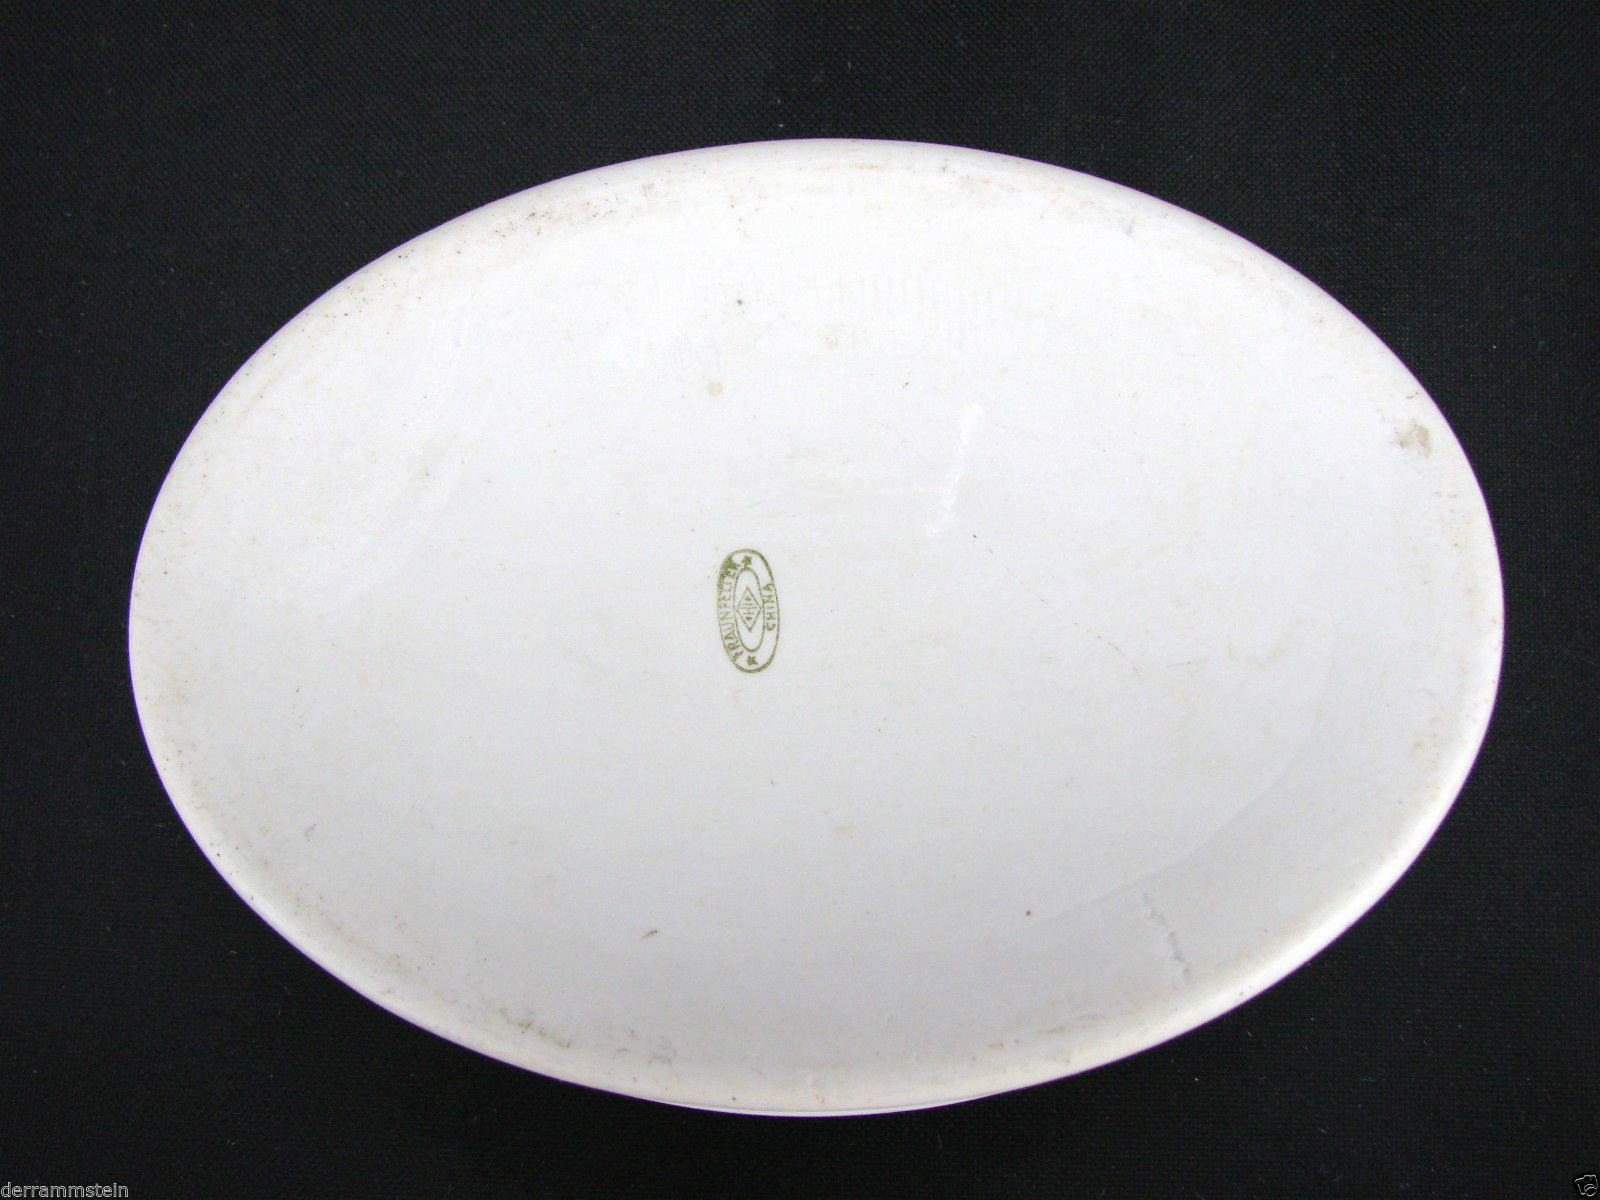 Vintage Fraunfelter White Pearl Lustre 1 Quart Casserole Dish